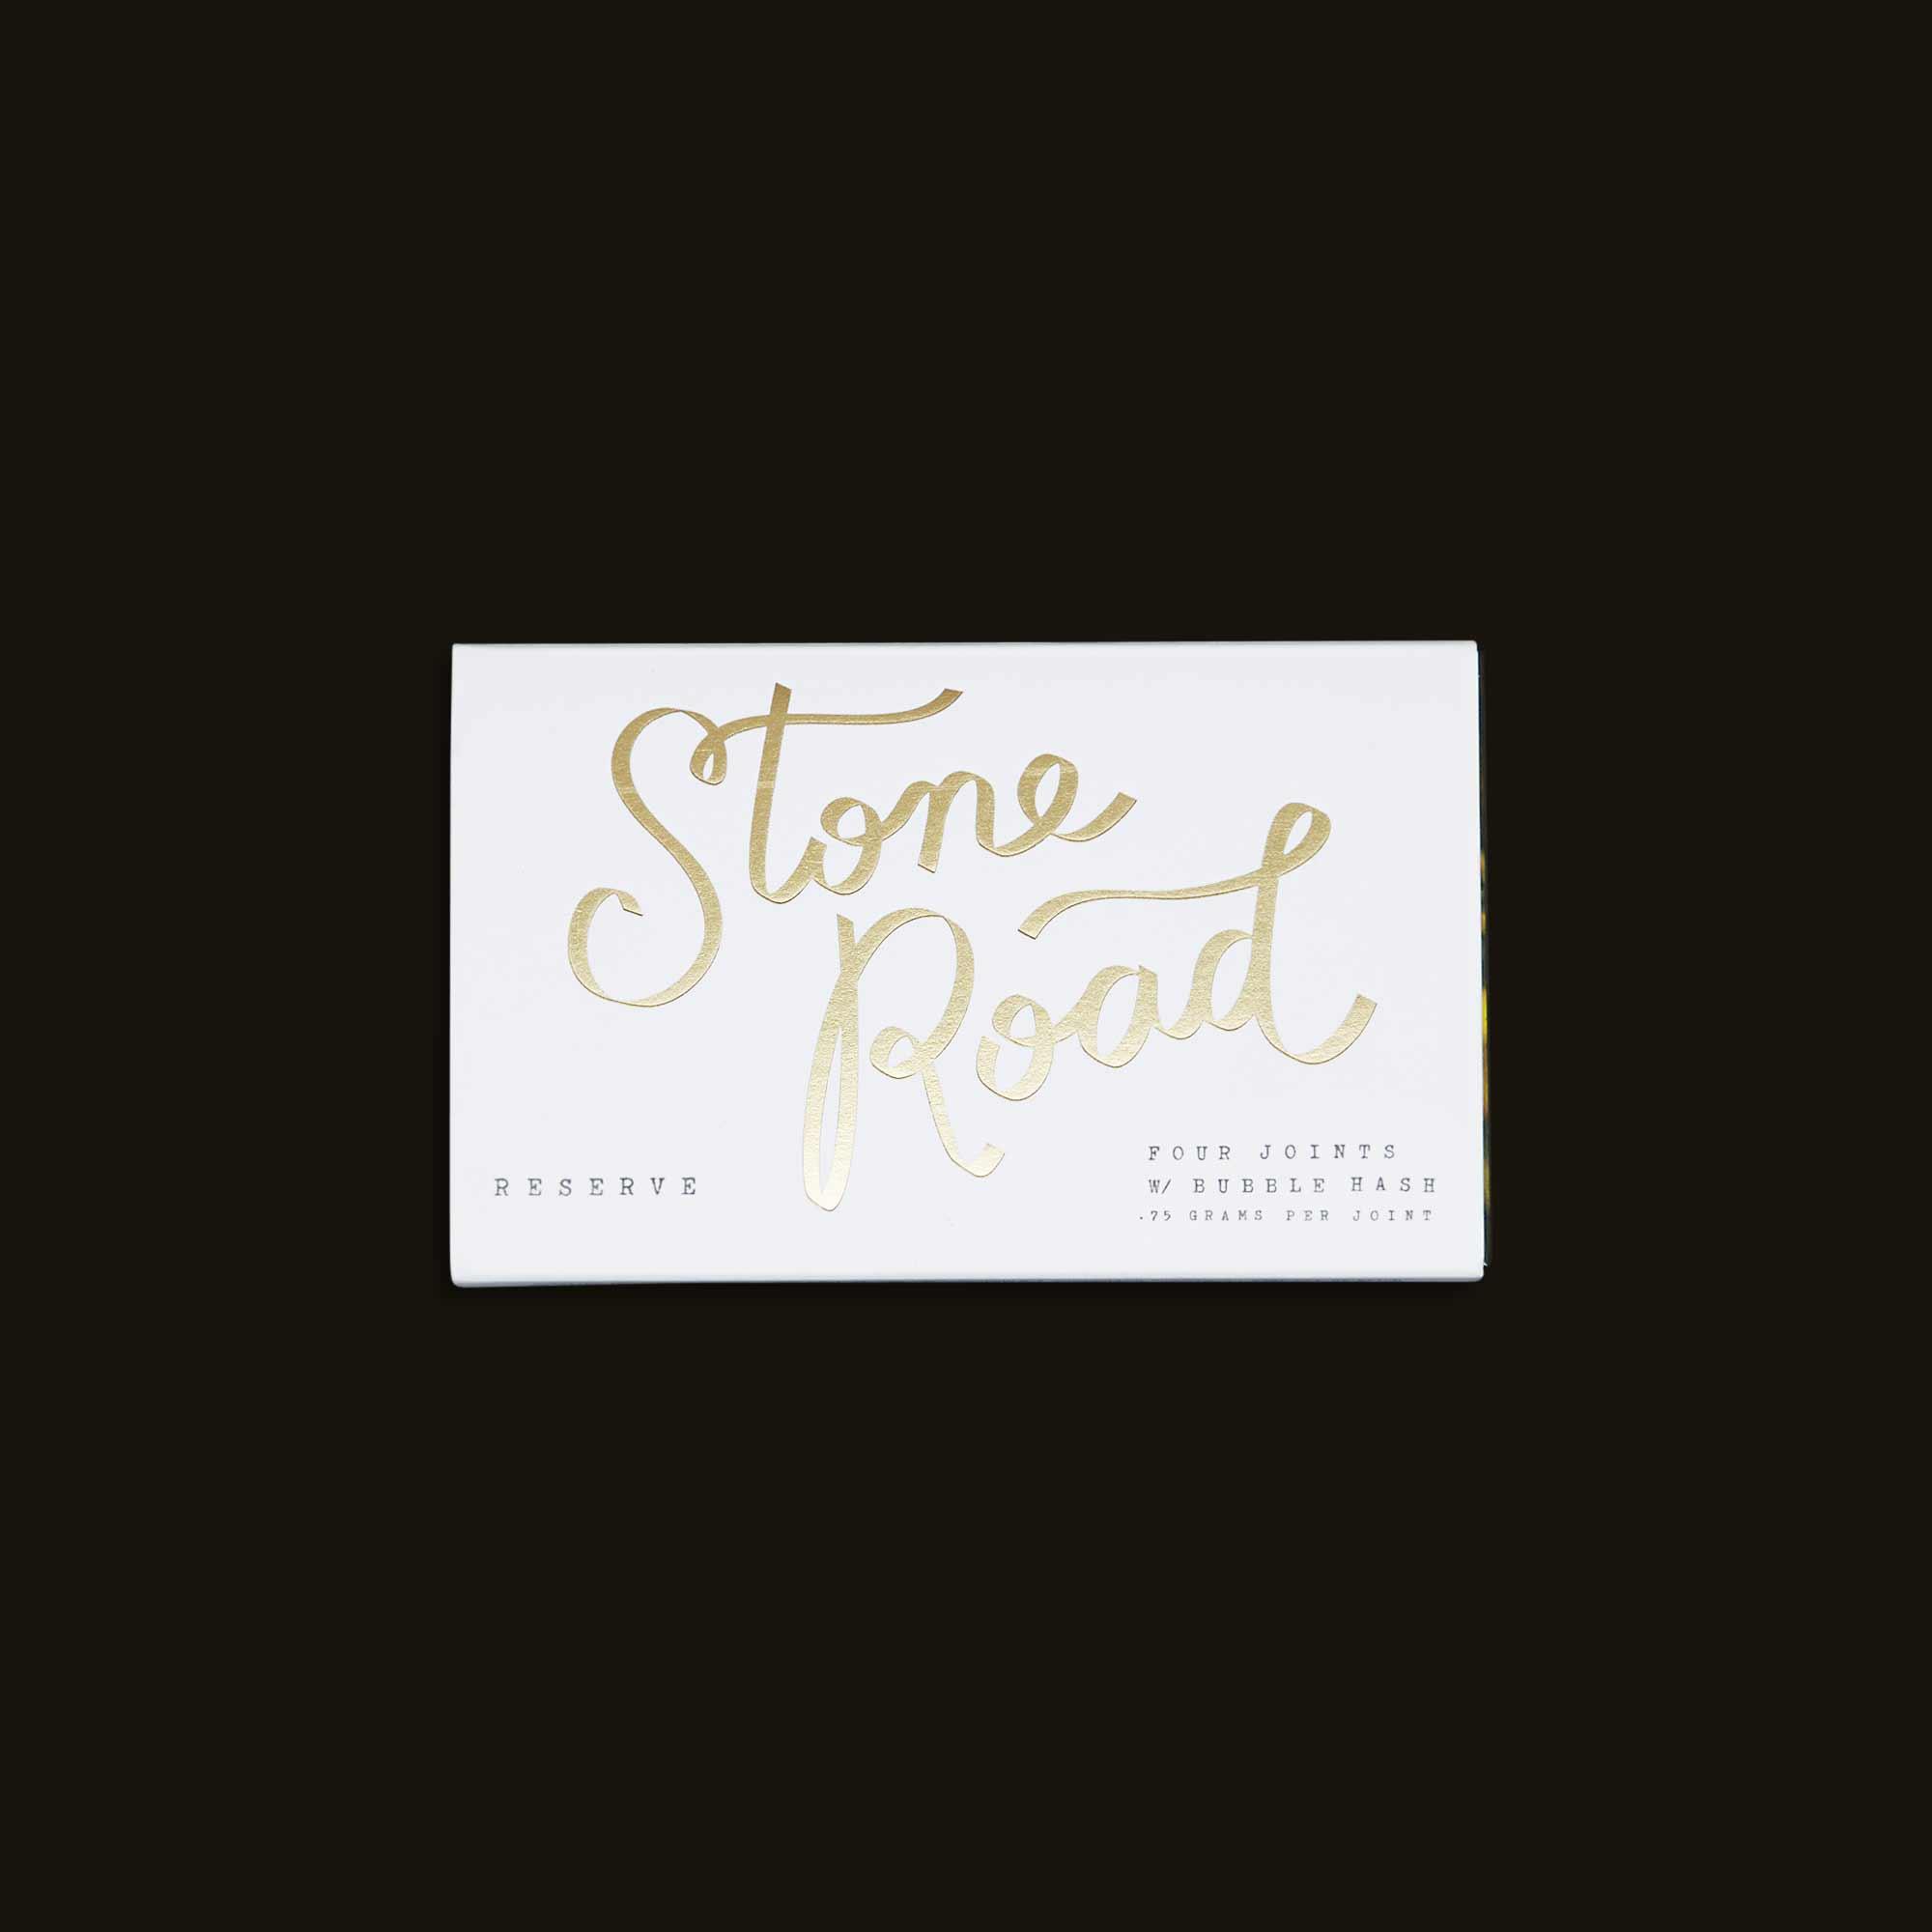 Stone Road Stone Road Reserve